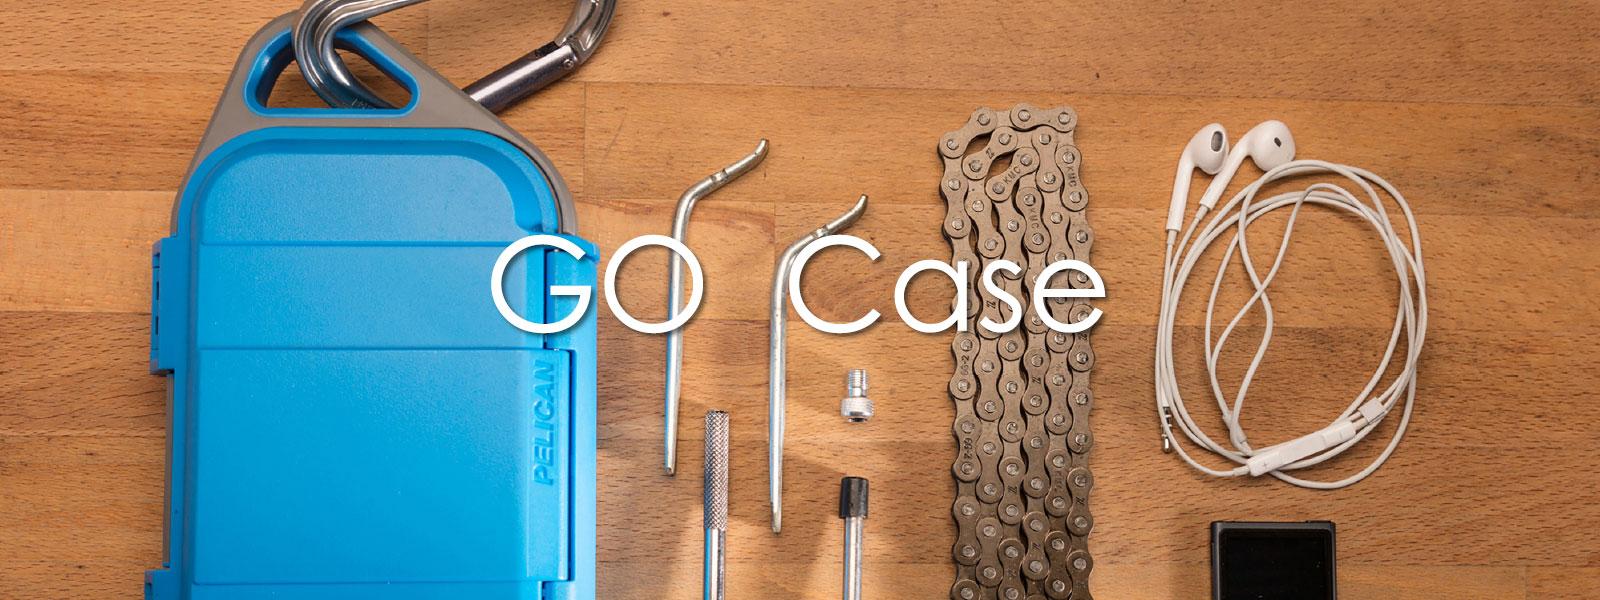 GO CASE